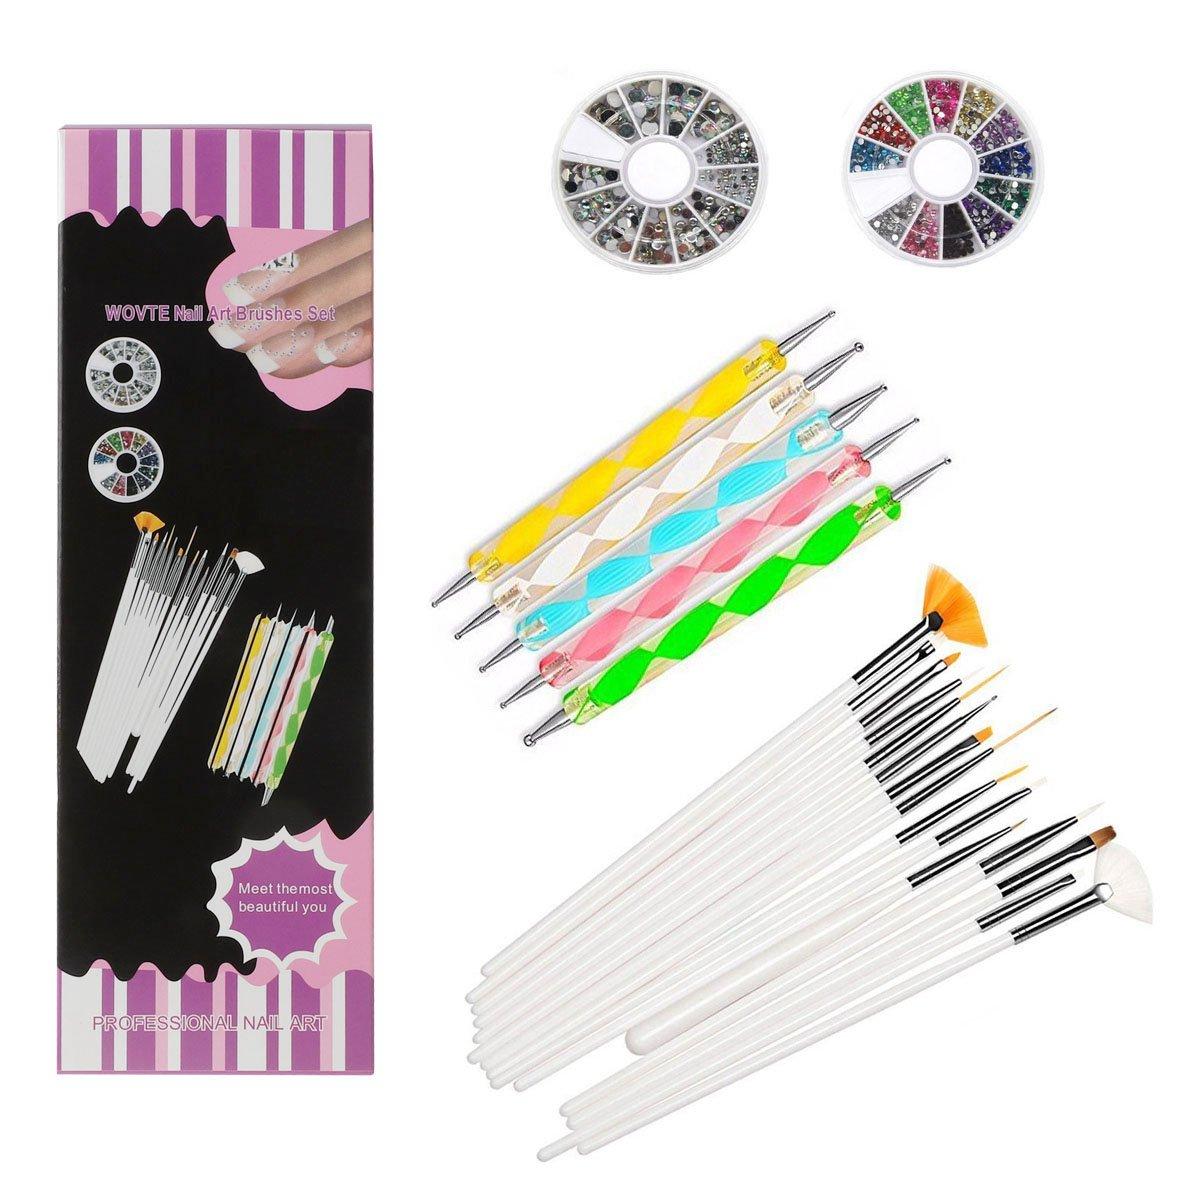 Amazon.com : WOVTE Nail Art and Gel Acrylic Drawing Makeup Brush Set ...